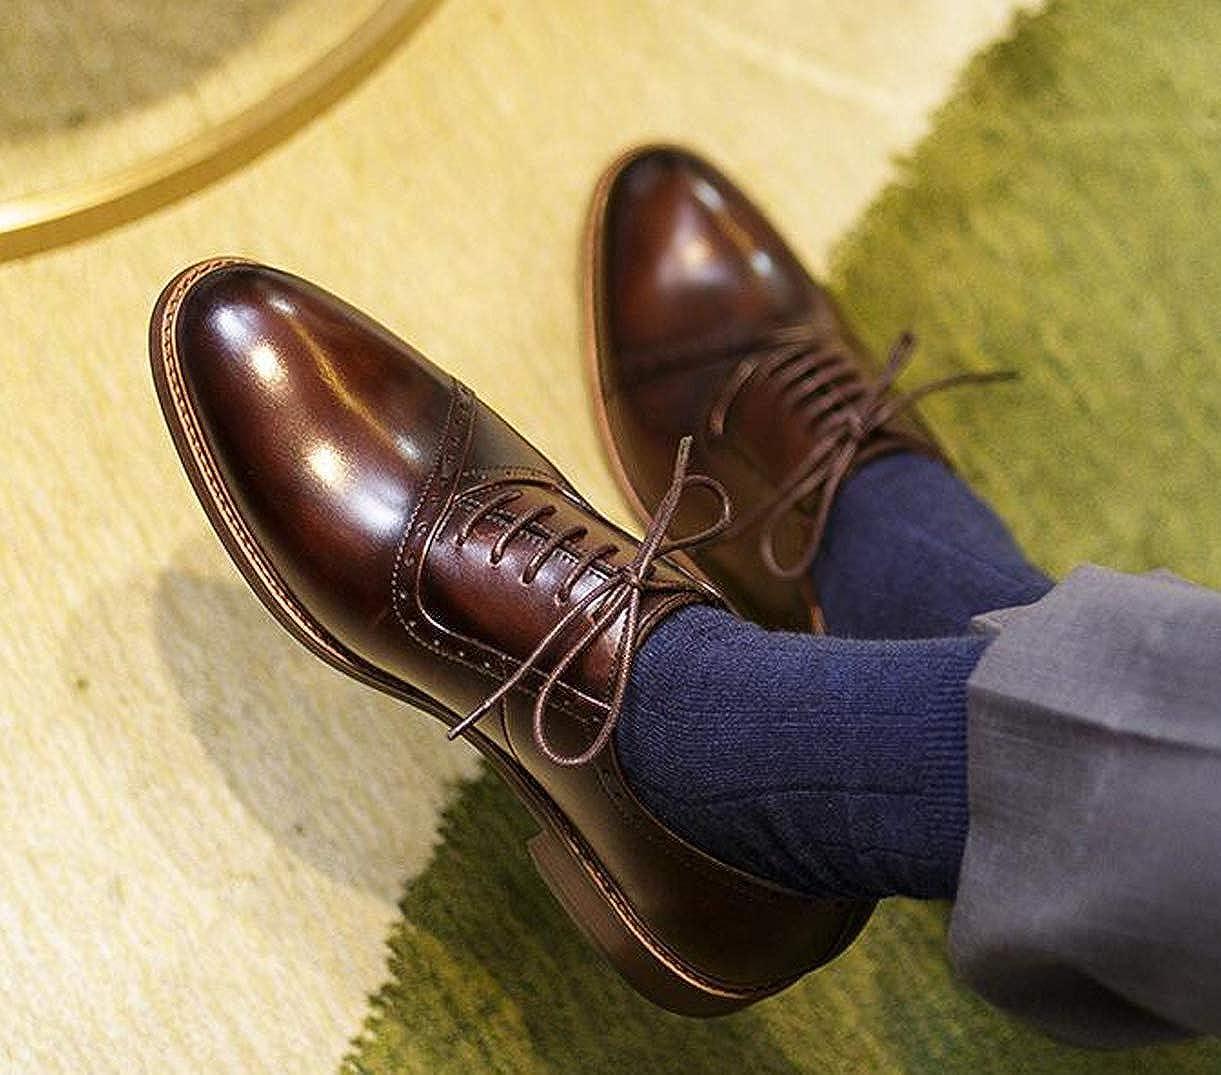 0bffac475342 Dark Brown Brown Brown .Carved Derby Pointed England Men's Leather ...